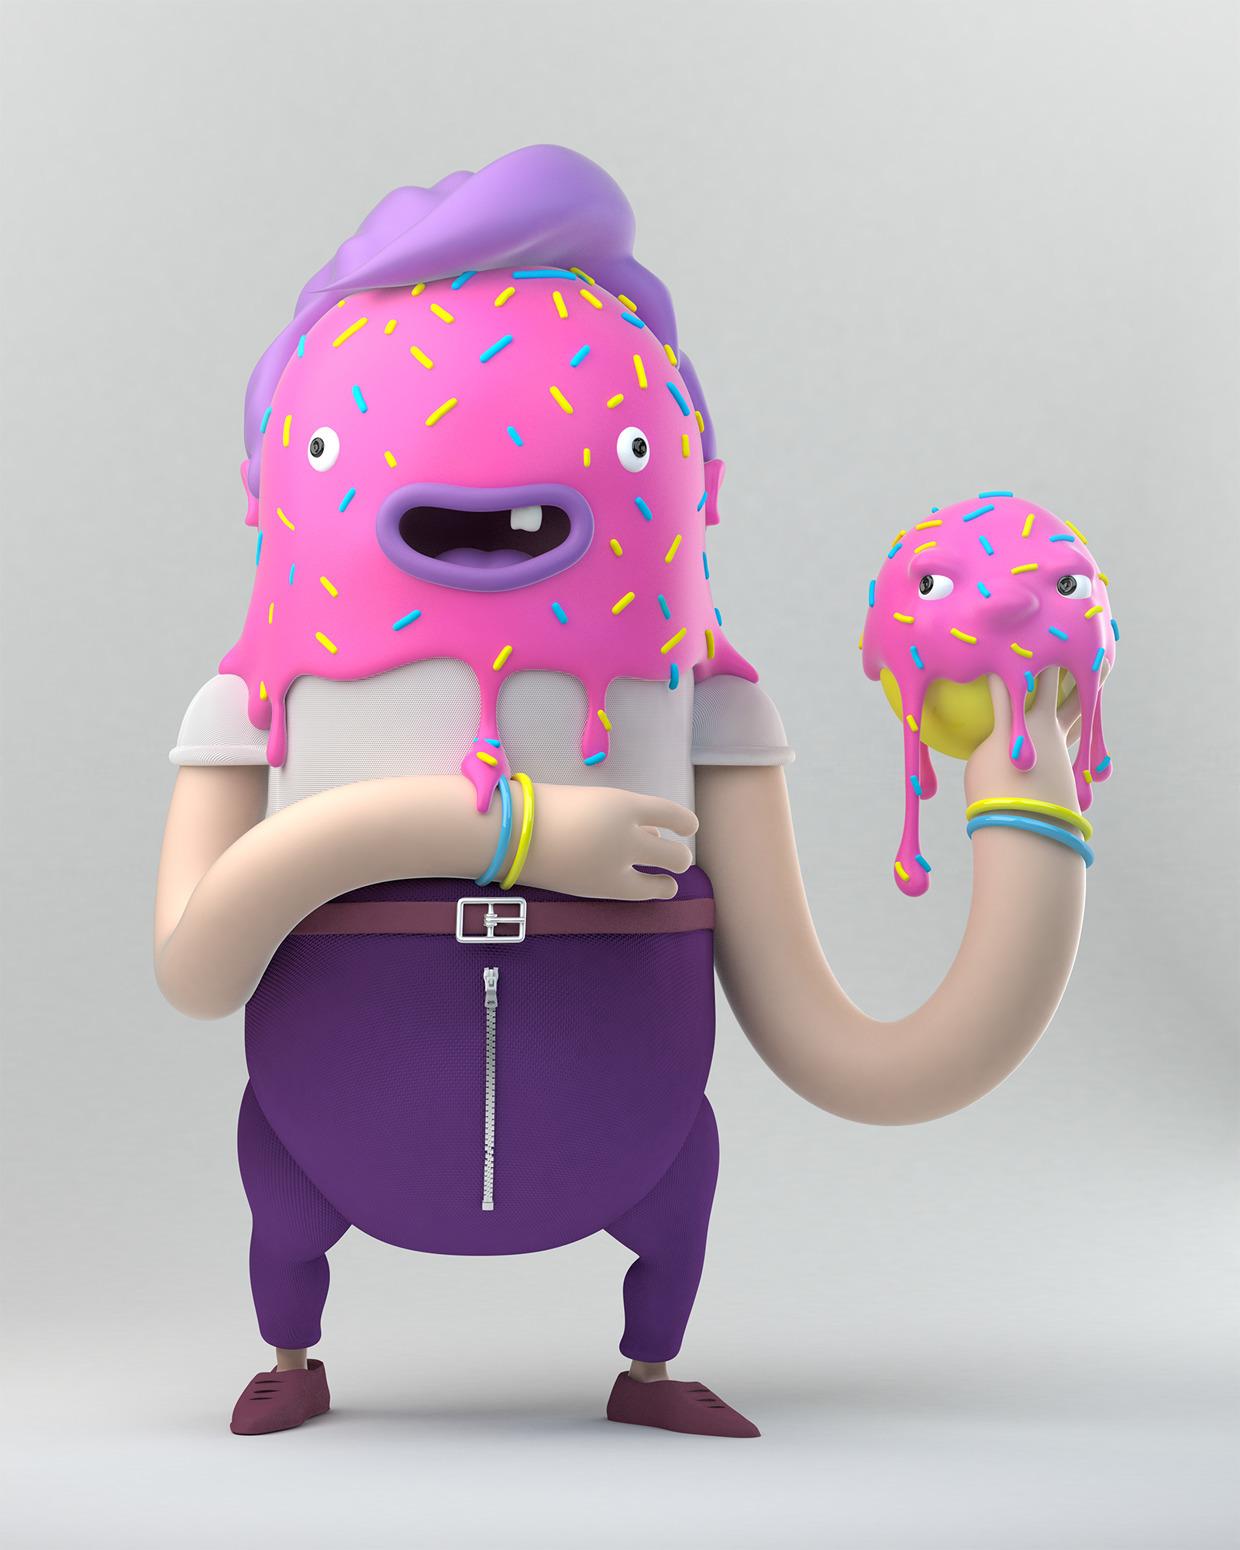 Hoola Bob - characterdesign, character - bard-2560   ello